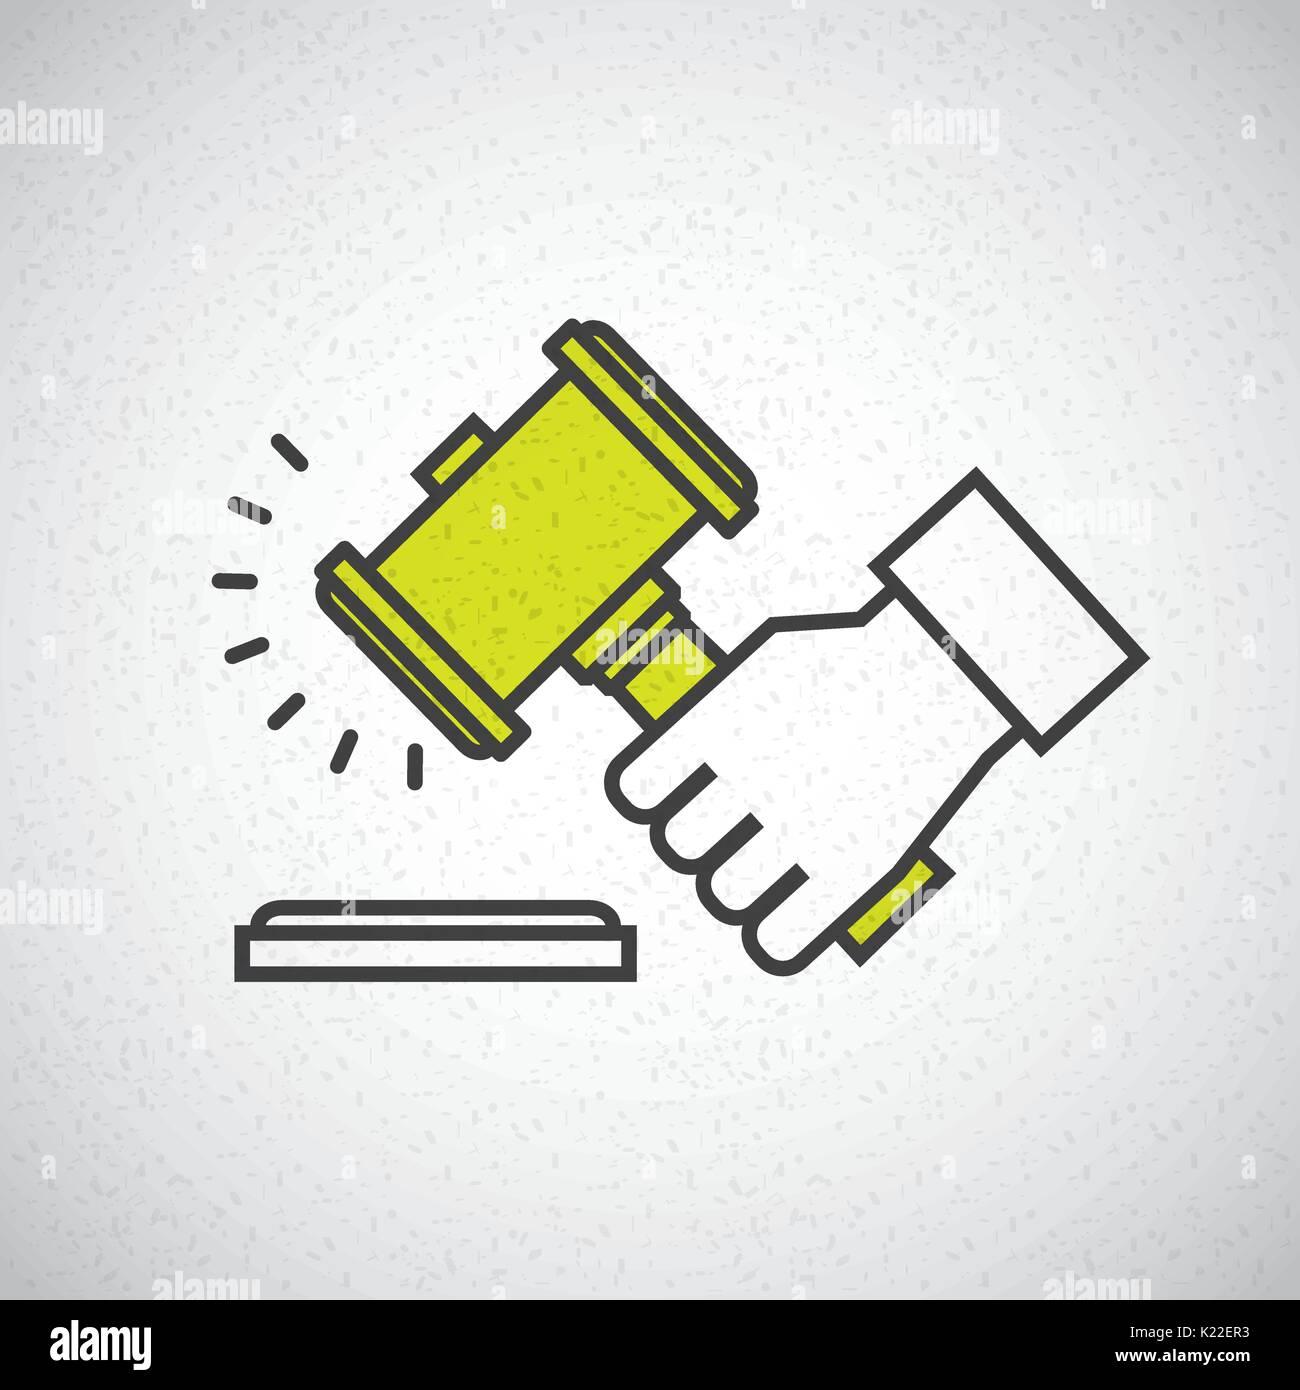 justice concept  design  - Stock Image